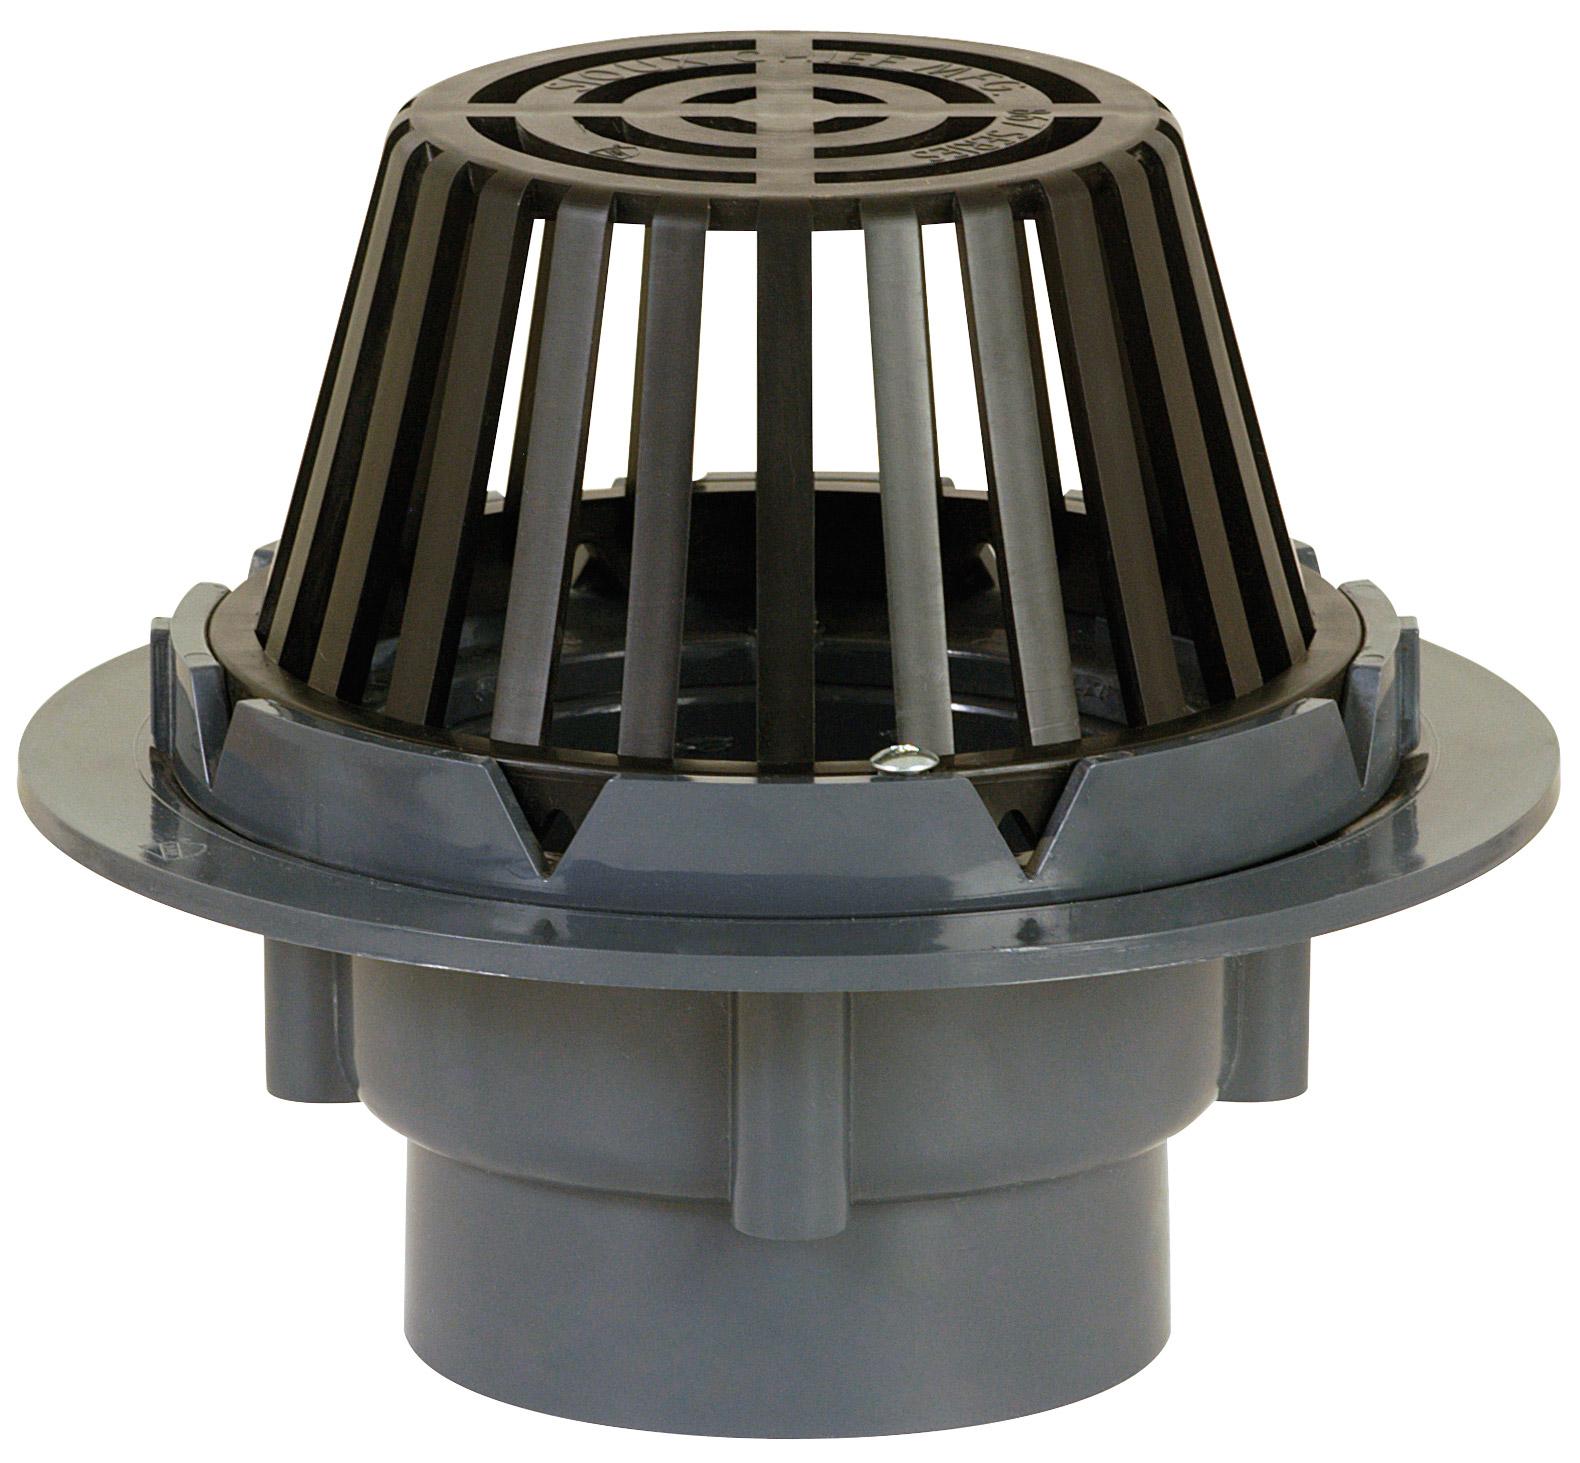 Wonderful 867 Series Solvent Weld Roof Drain